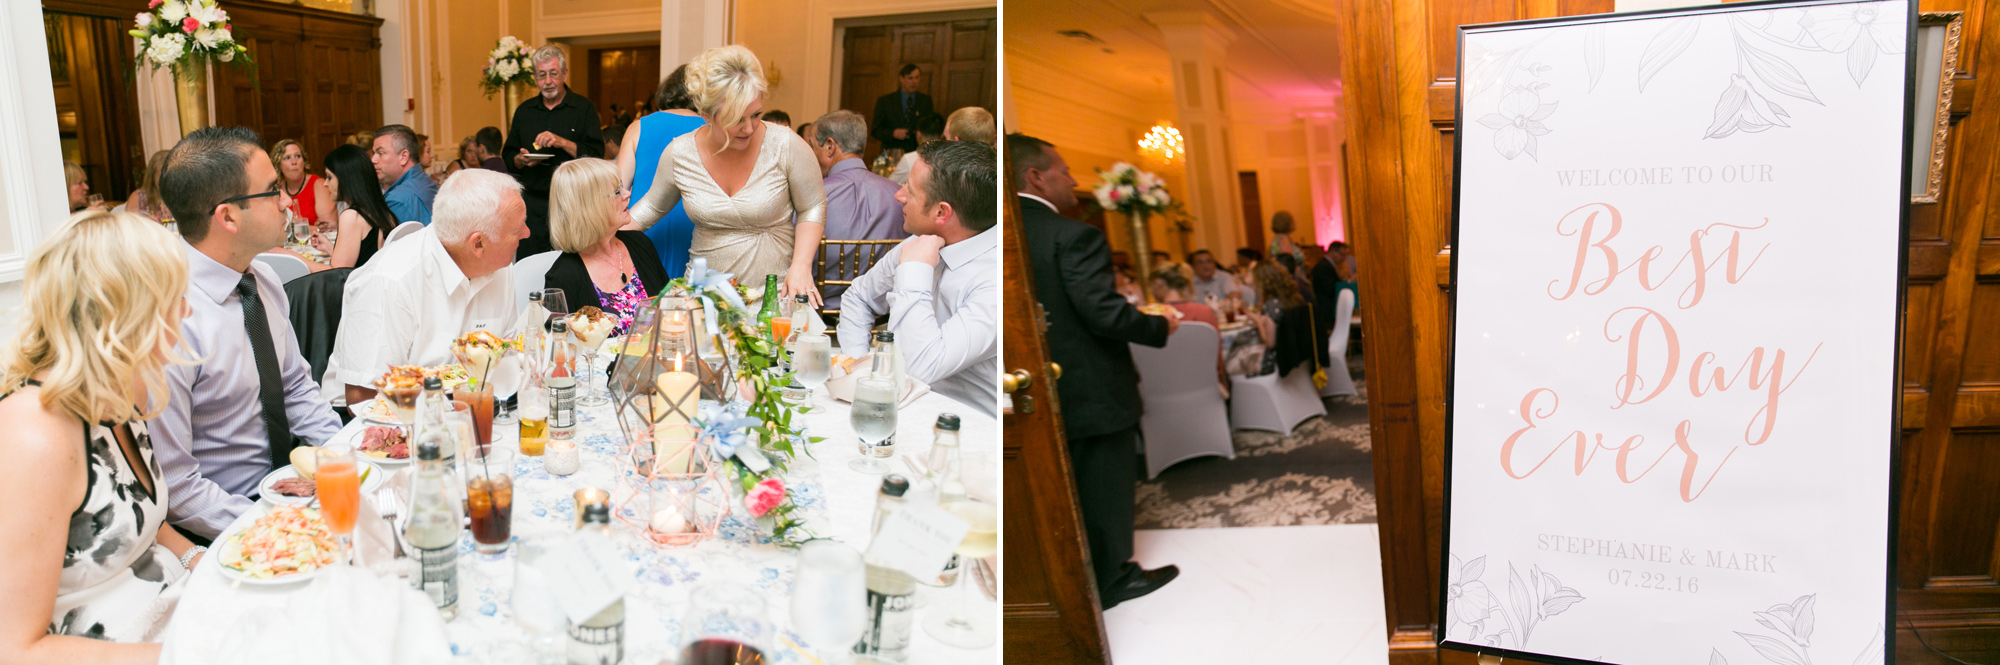 109-lord-nelson-wedding------.jpg